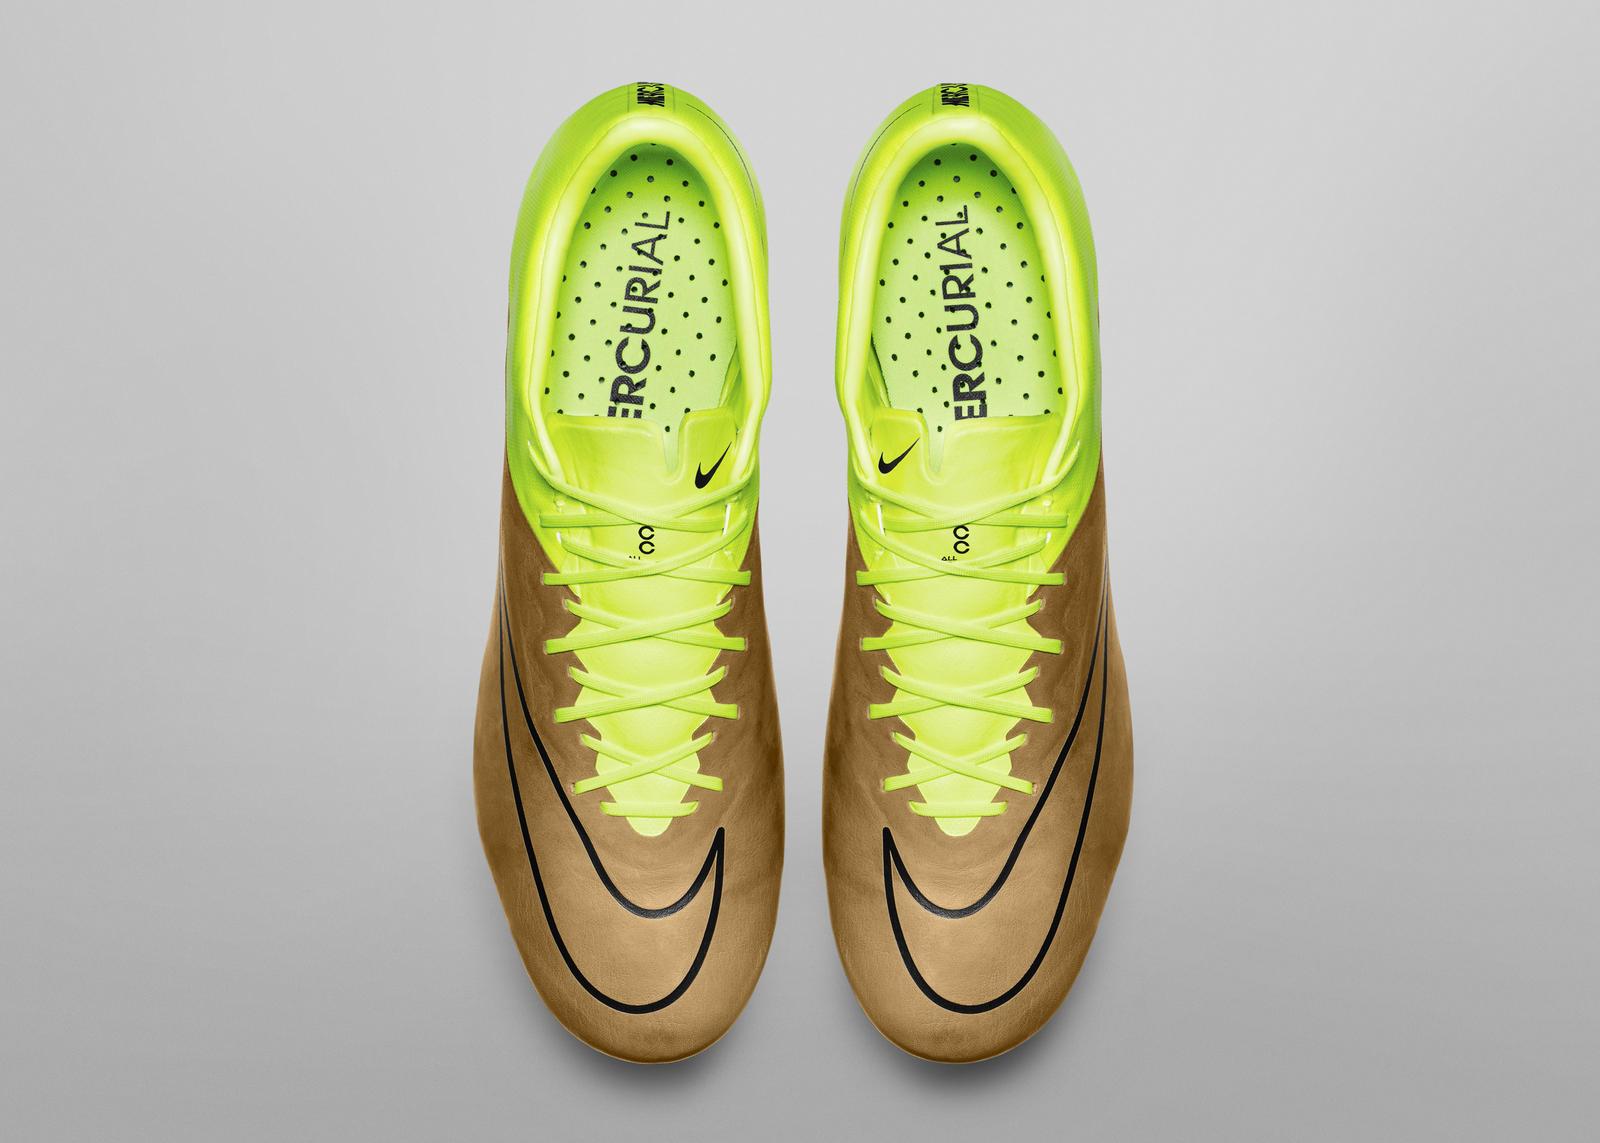 3e7900b6cf0 Nike Mid Cut Shoes Nike Mid Cut Tennis Shoe